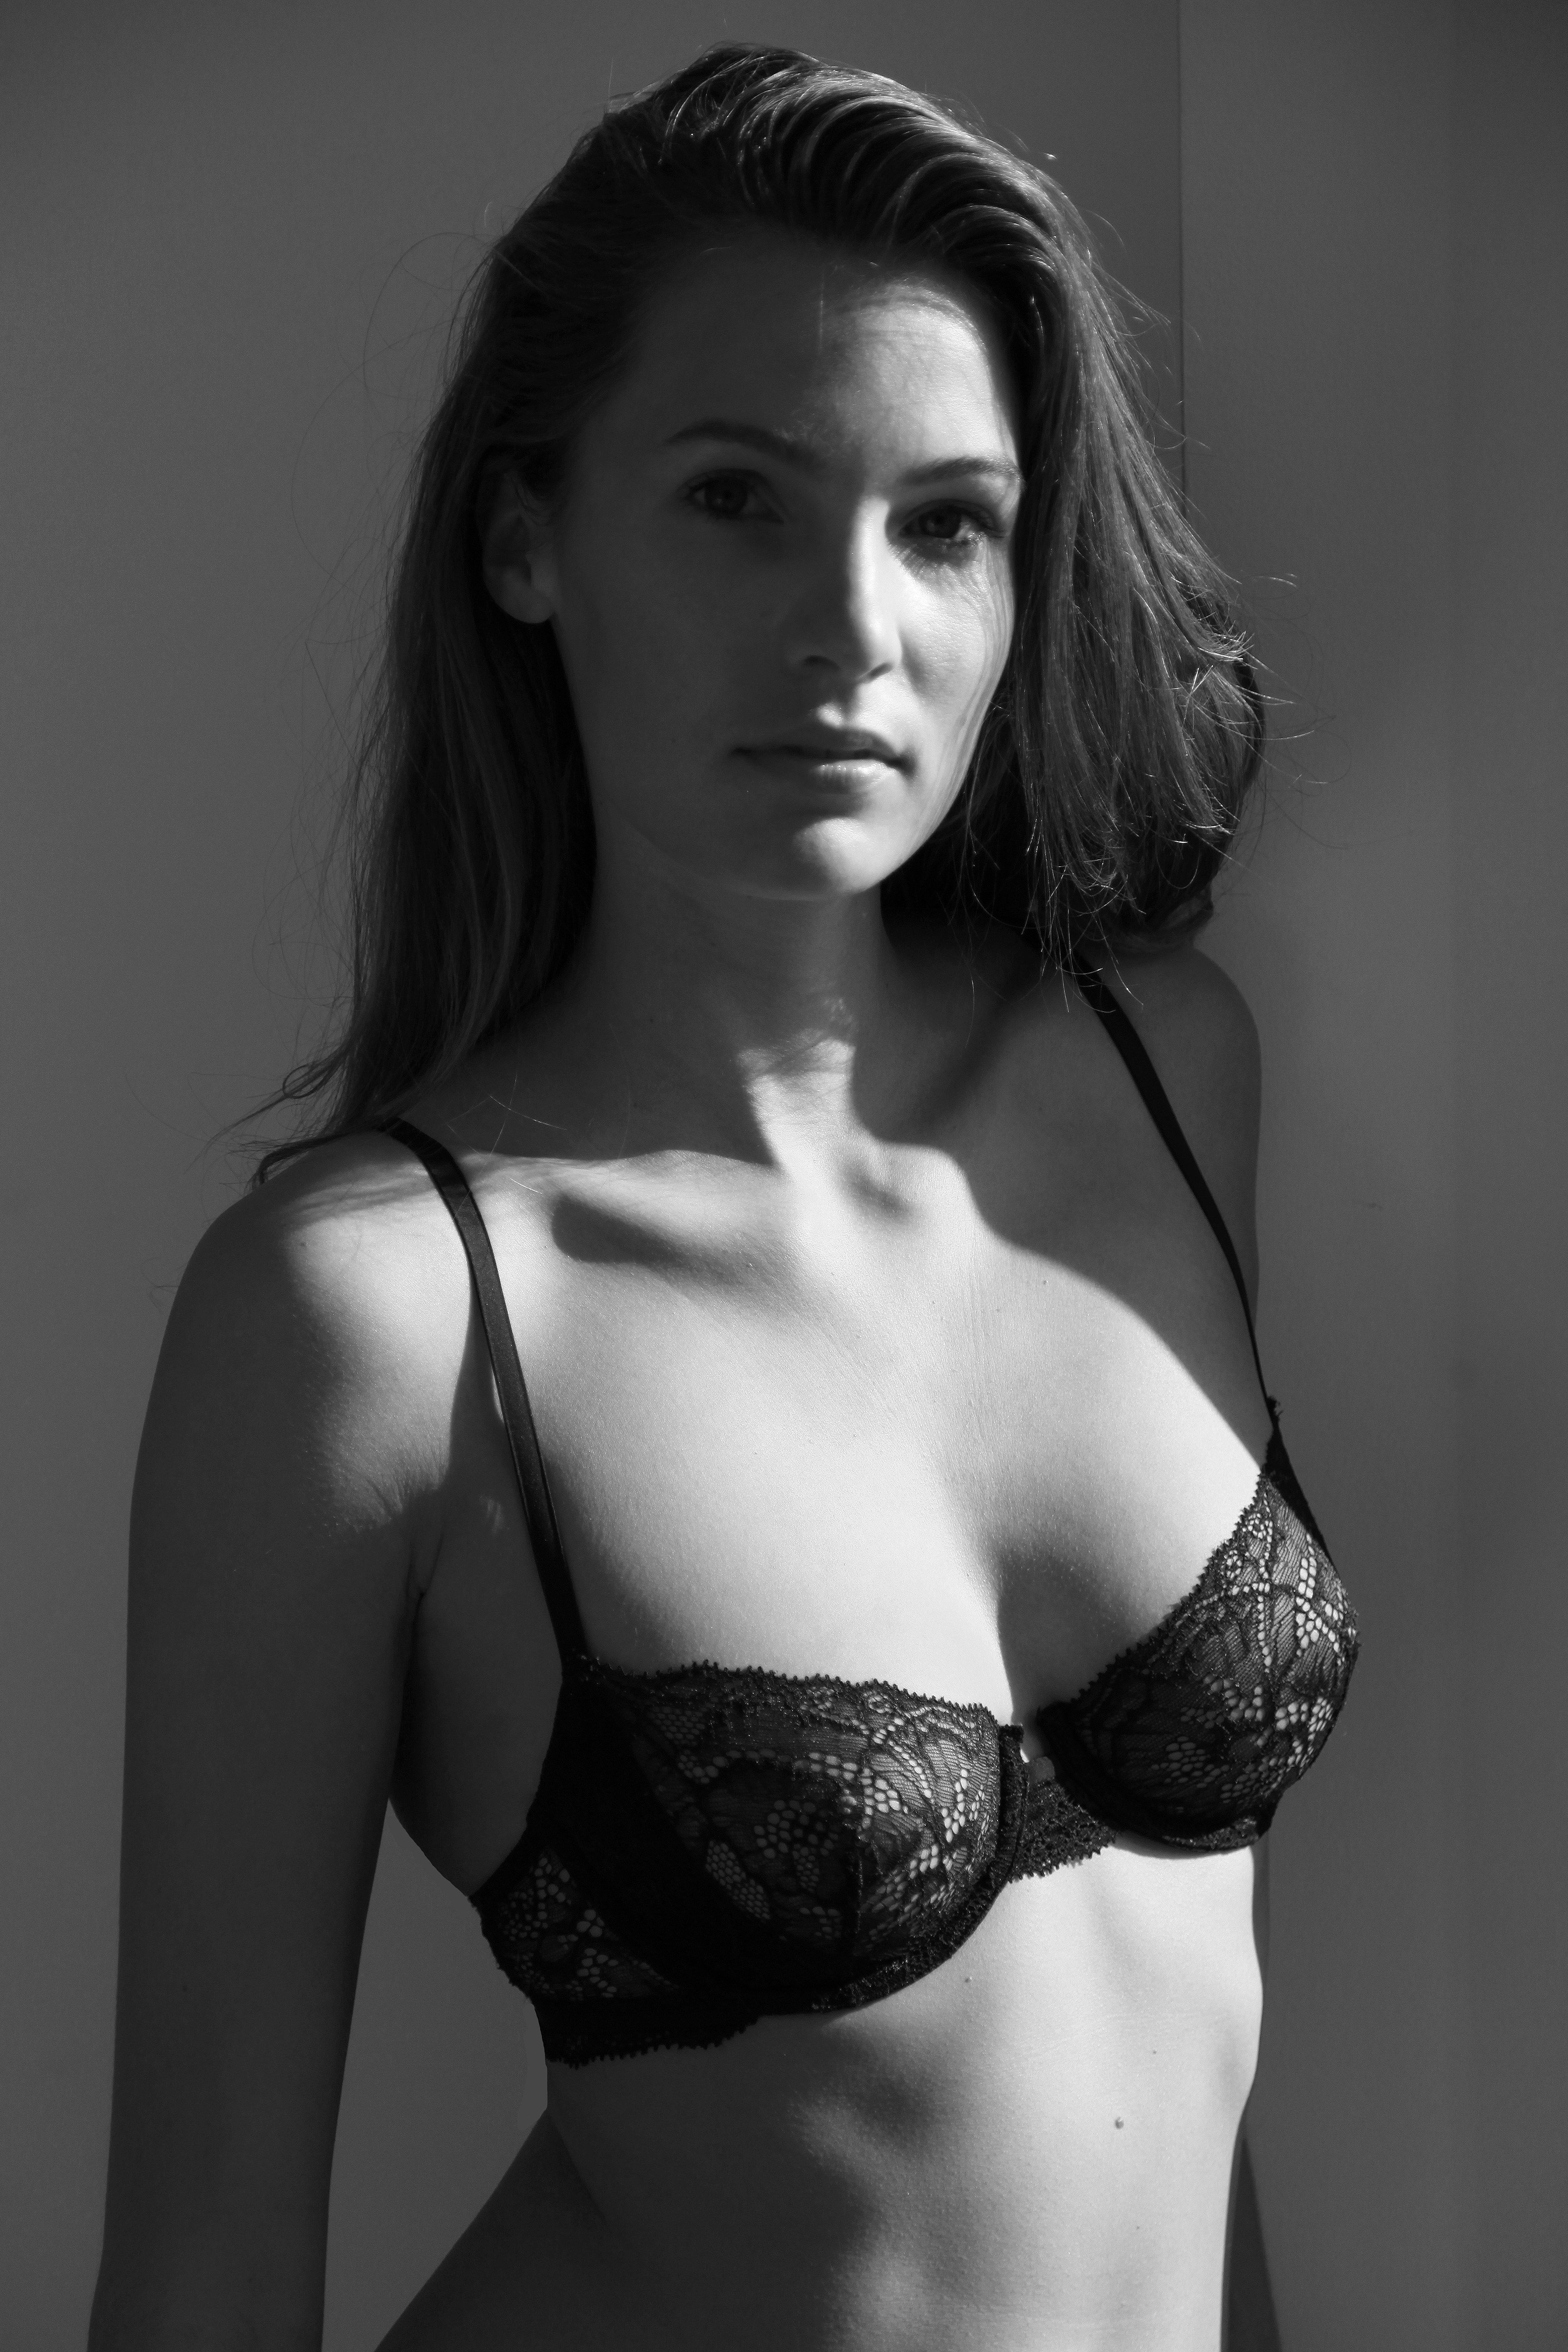 Bikini Teresa Dilger nude (94 photo), Paparazzi